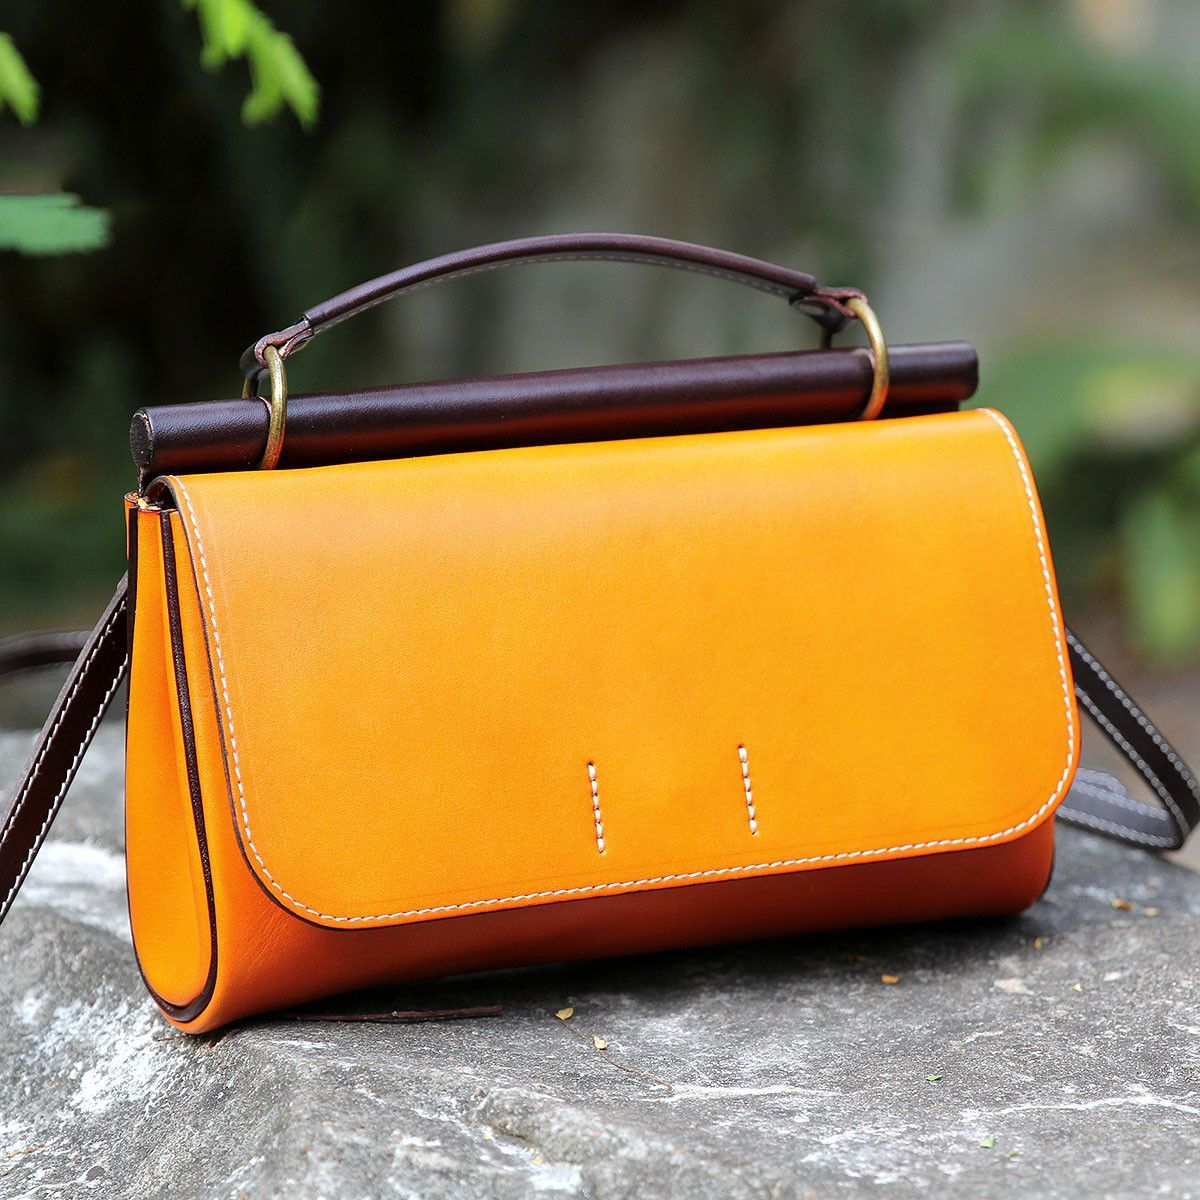 Handmade Genuine Green Leather Handbag Clutch Small Satchel Messenger For Women 14102